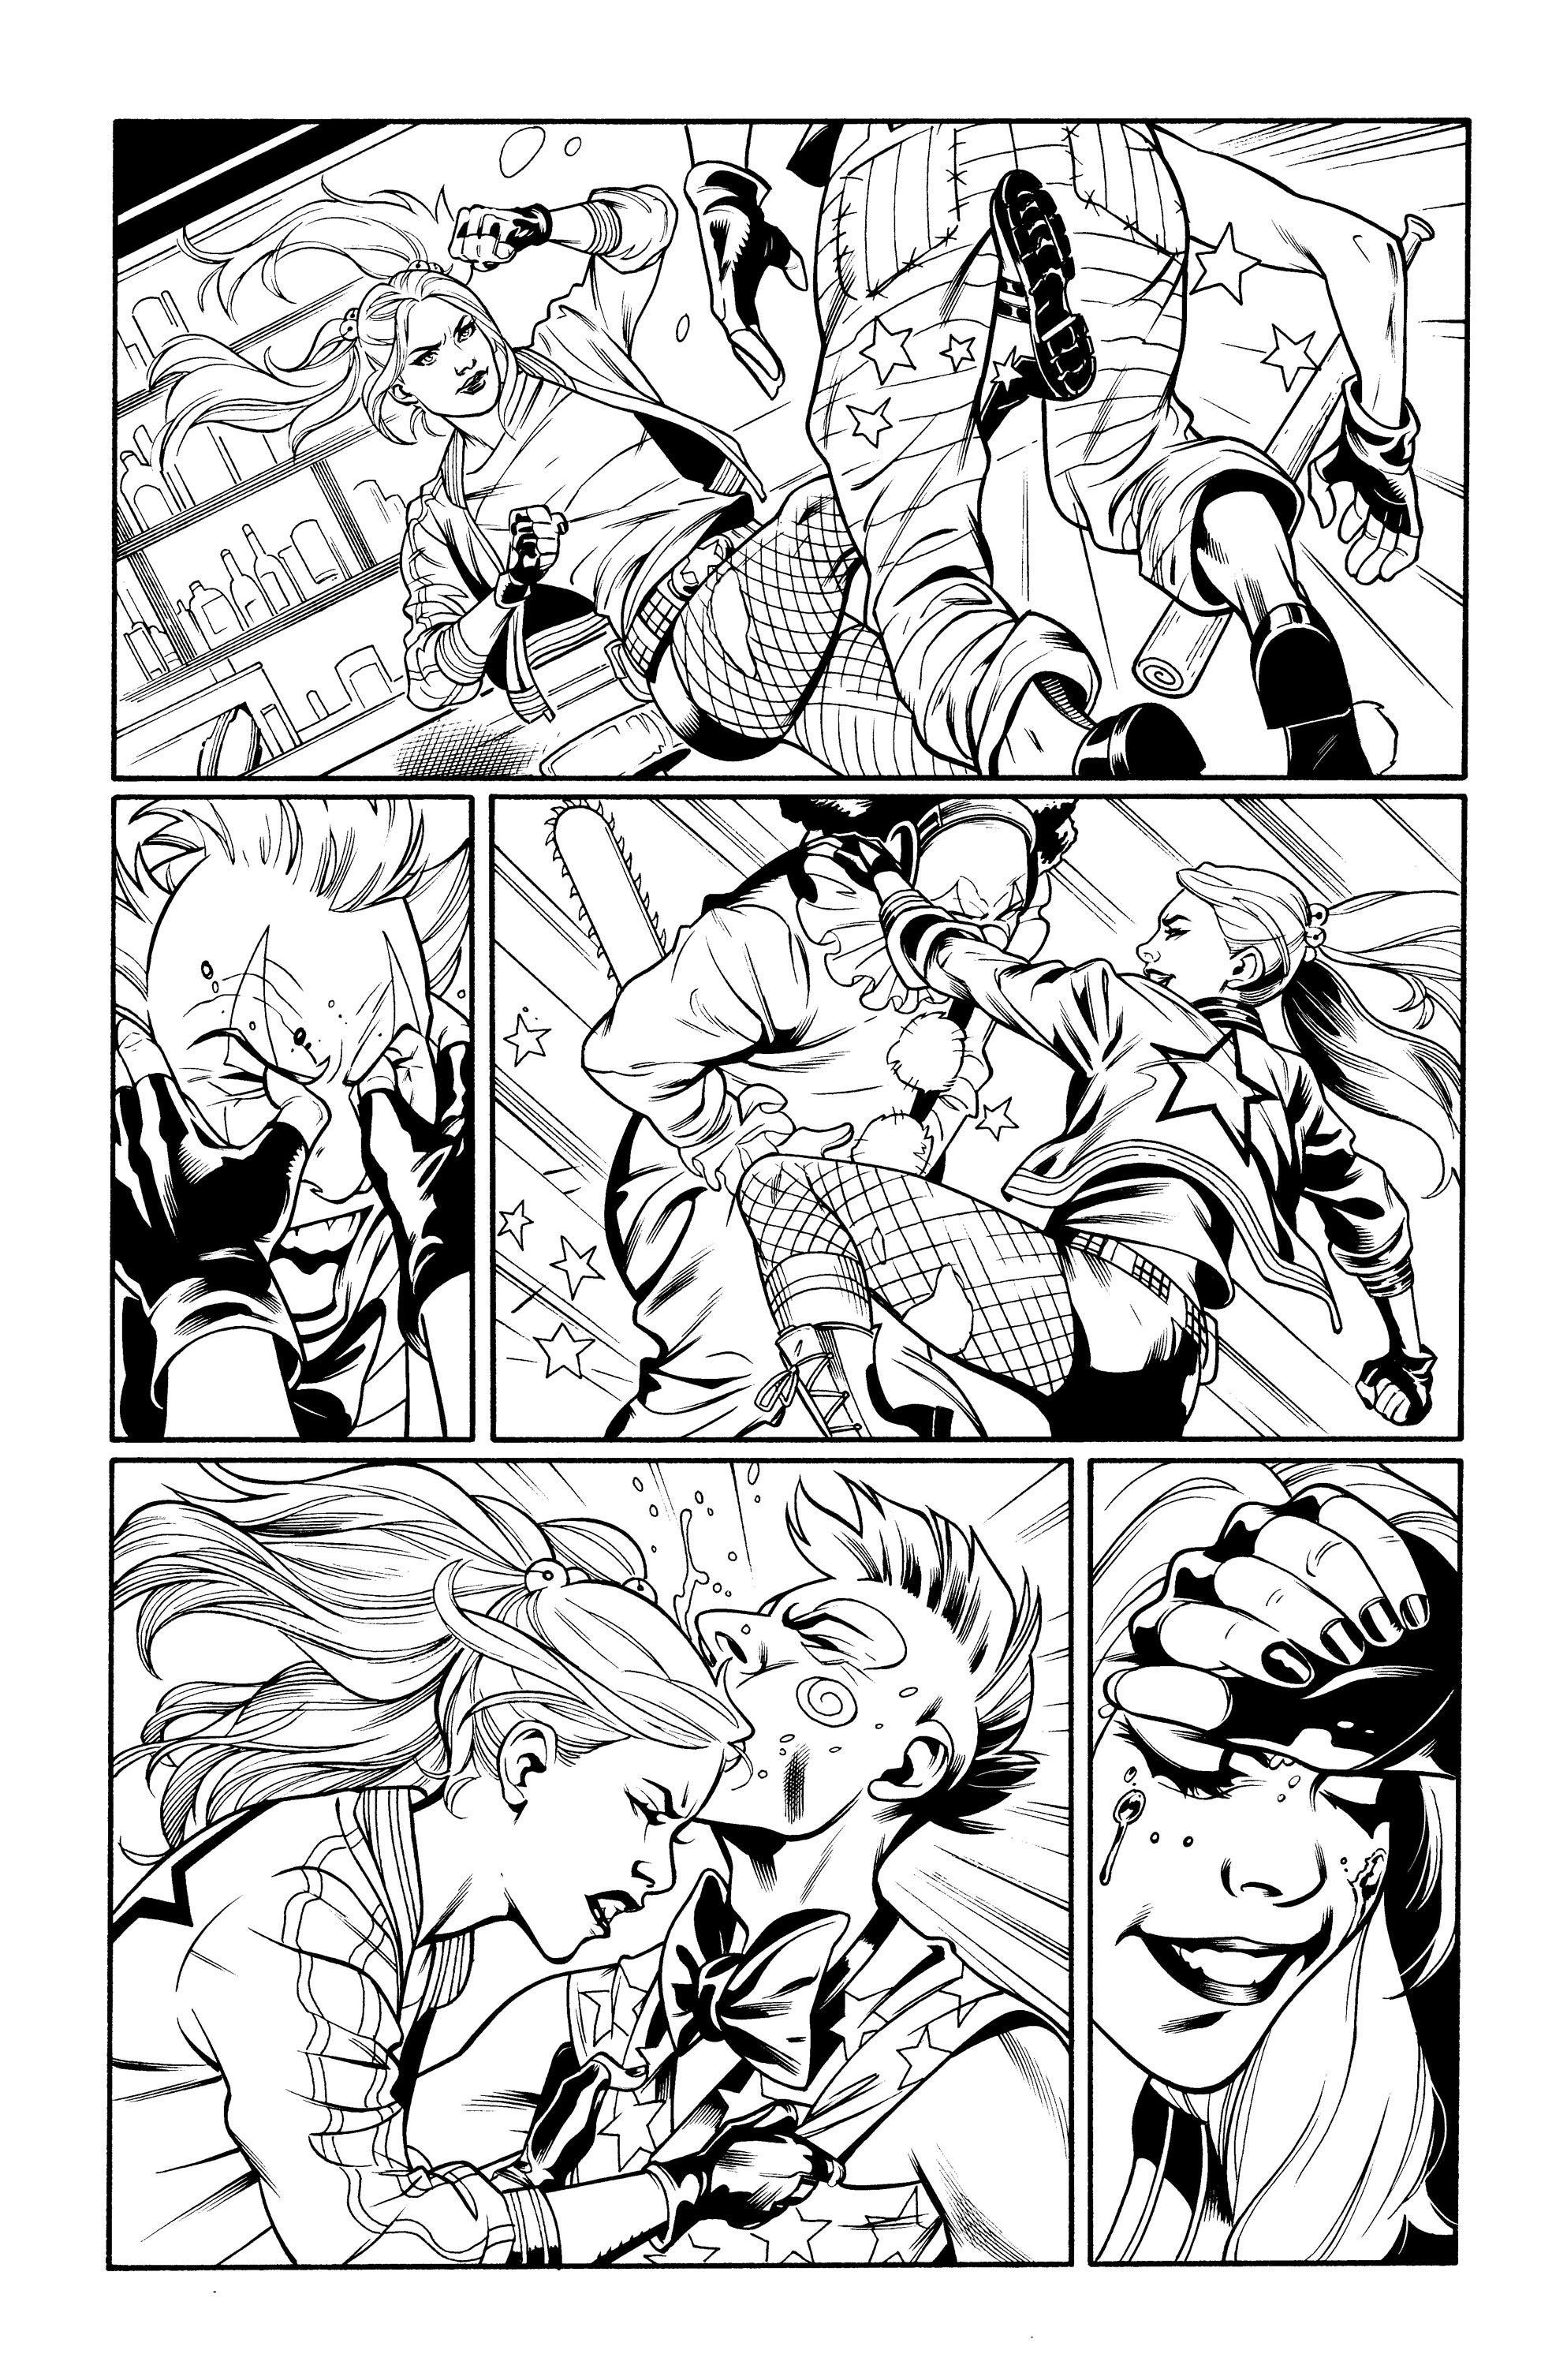 Image: Emanuela Lupacchino, Ray McCarthy, and Nicholas Filardi., DC Comics